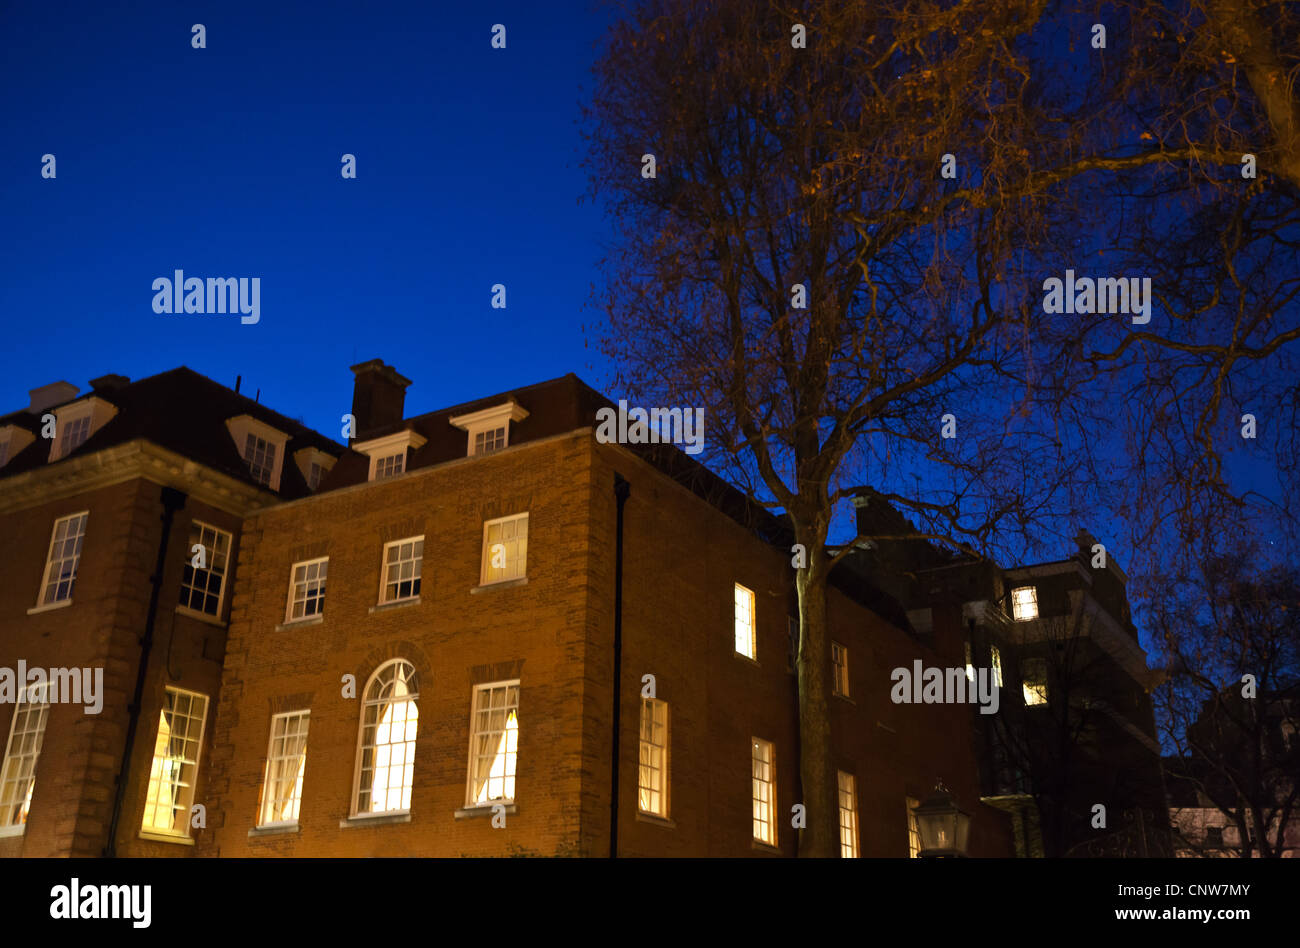 Europe Angleterre Londres, une maison dans Halkin Street Photo Stock